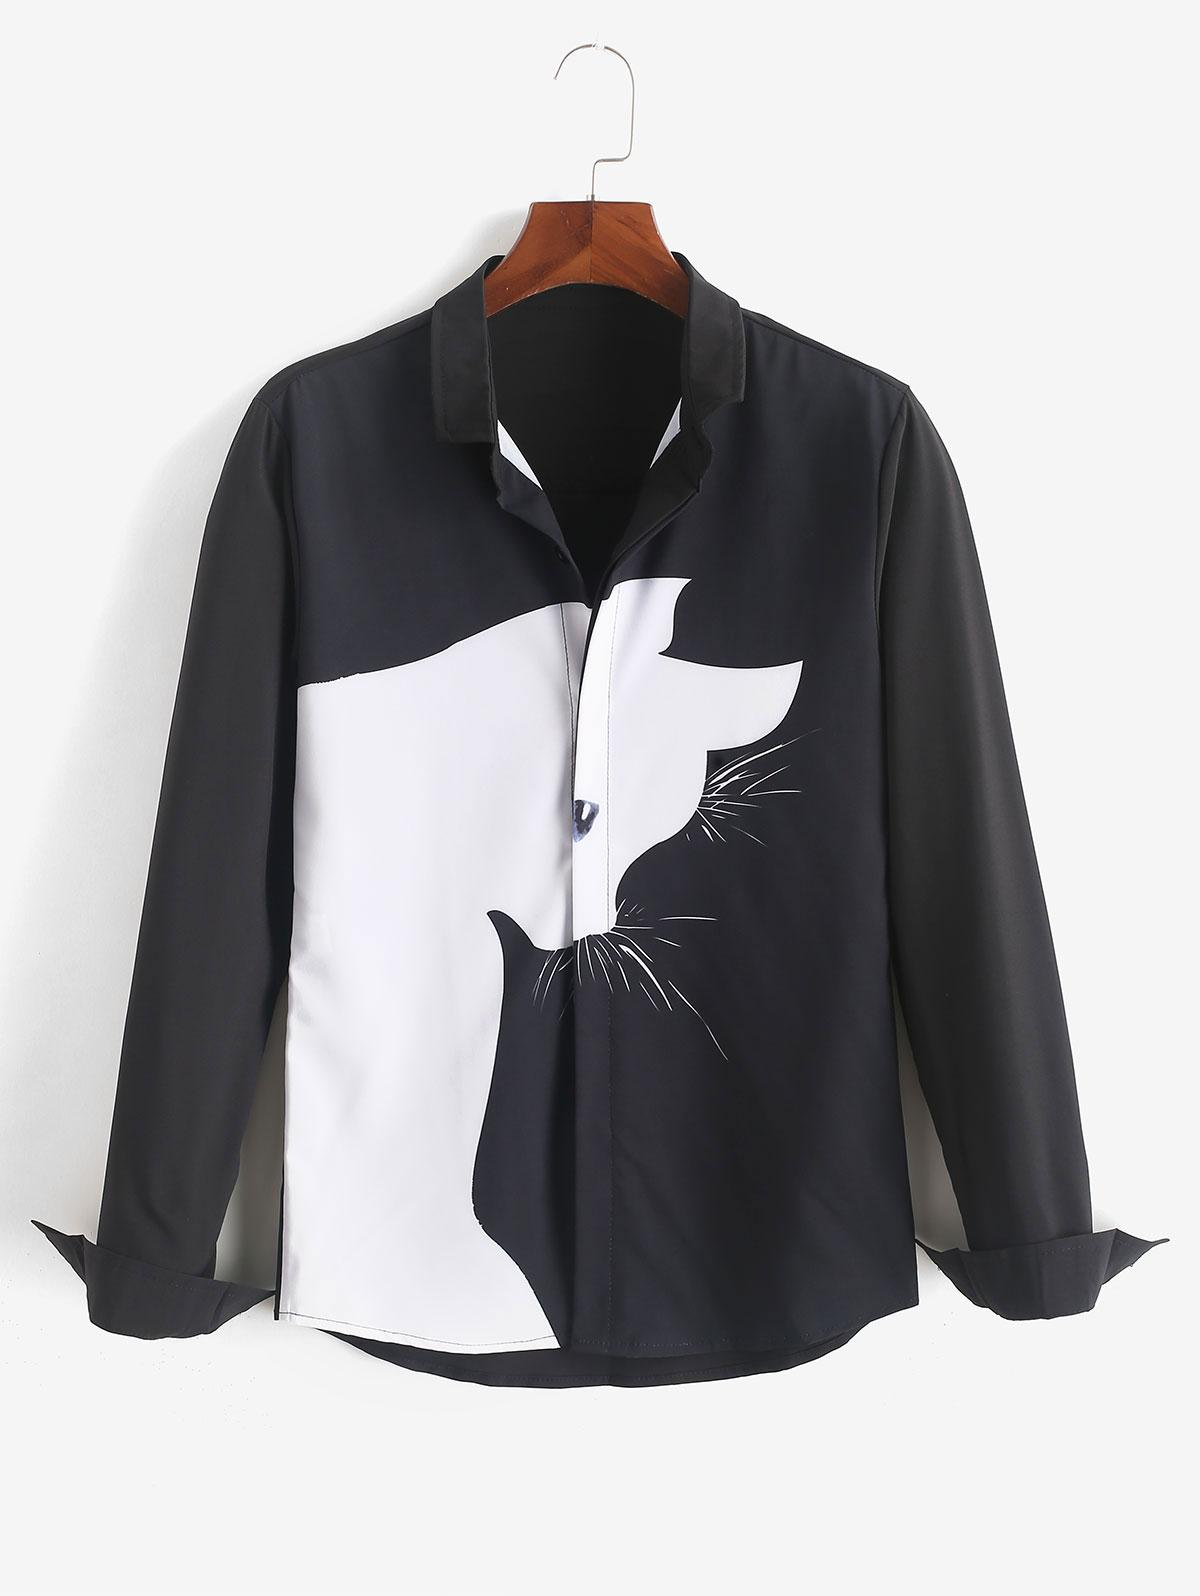 20 Off 2020 Cartoon Cat Print Button Up Casual Shirt In Black Zaful